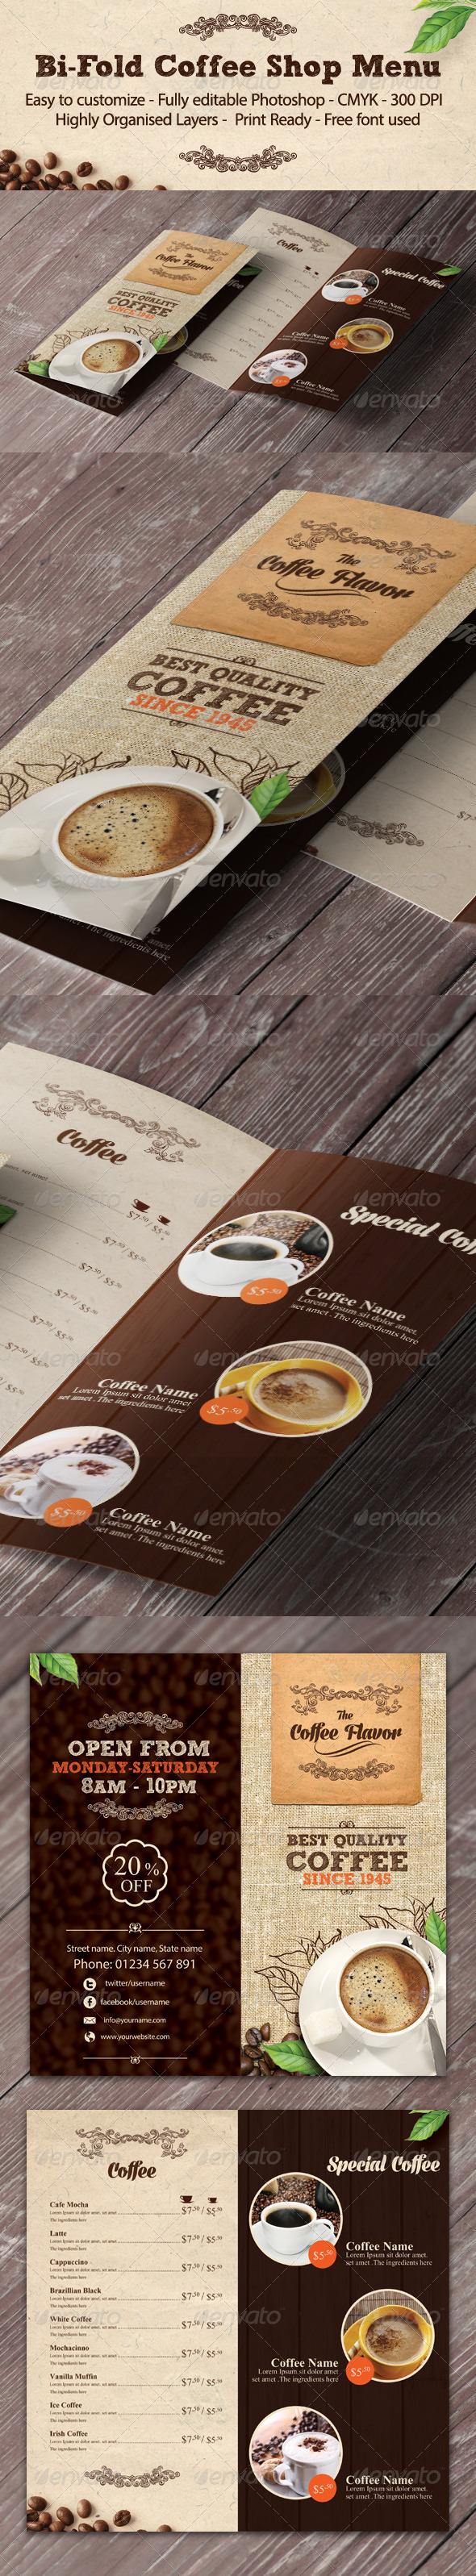 Bi-fold Coffee Shop Menu Template - Food Menus Print Templates